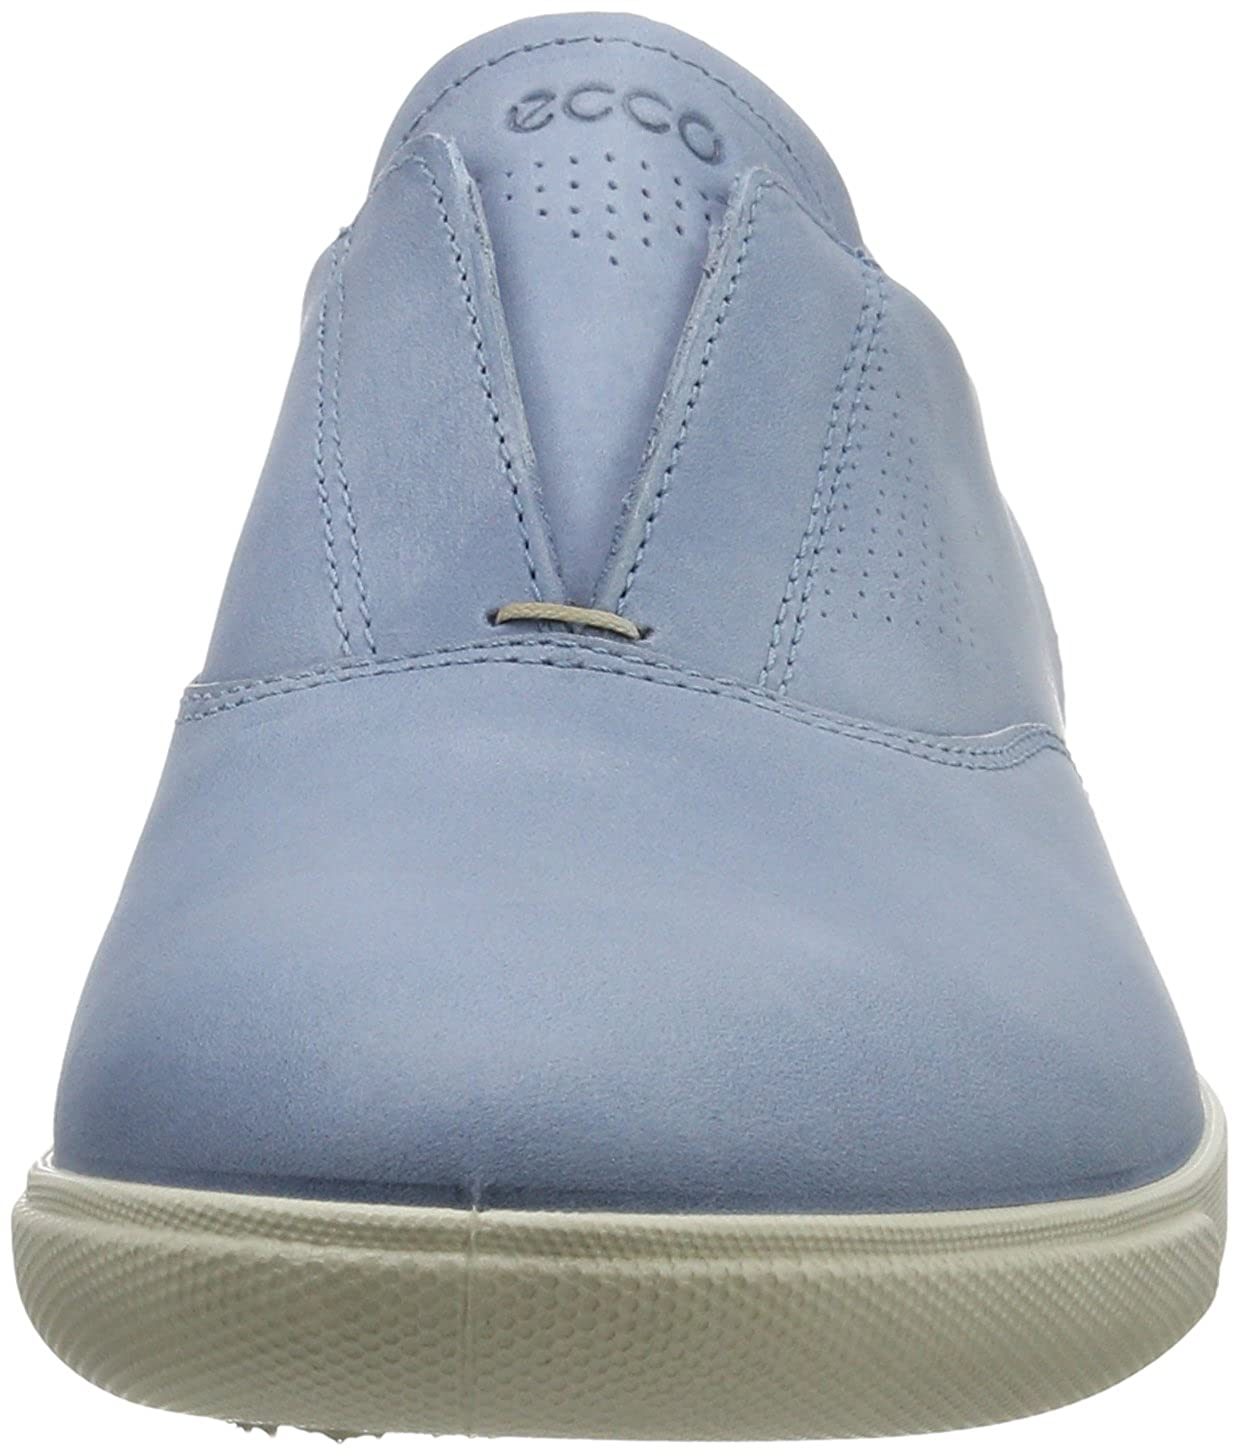 Ecco Damen Damara Slipper Blau Blau) (2471retro Blau) Blau 81afe4